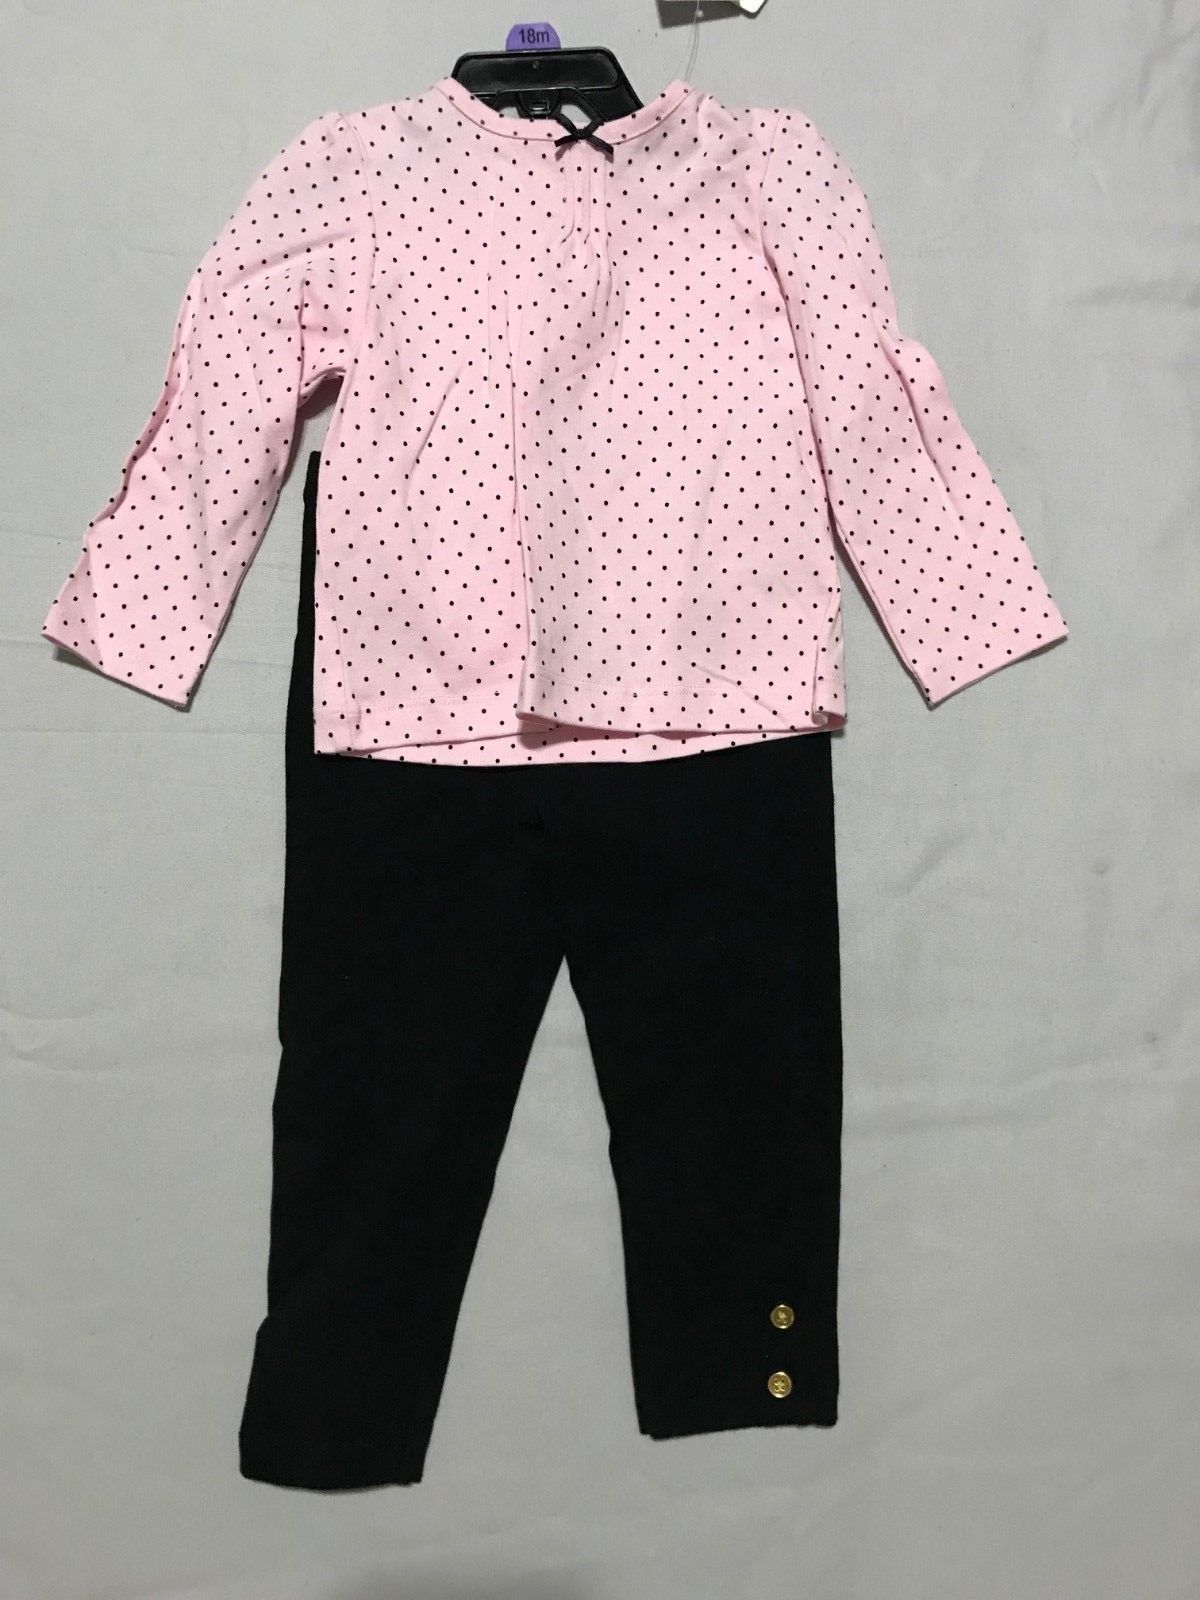 Mens Hoodie Sweater Yizzam Allover Print Blackberries Jumbo